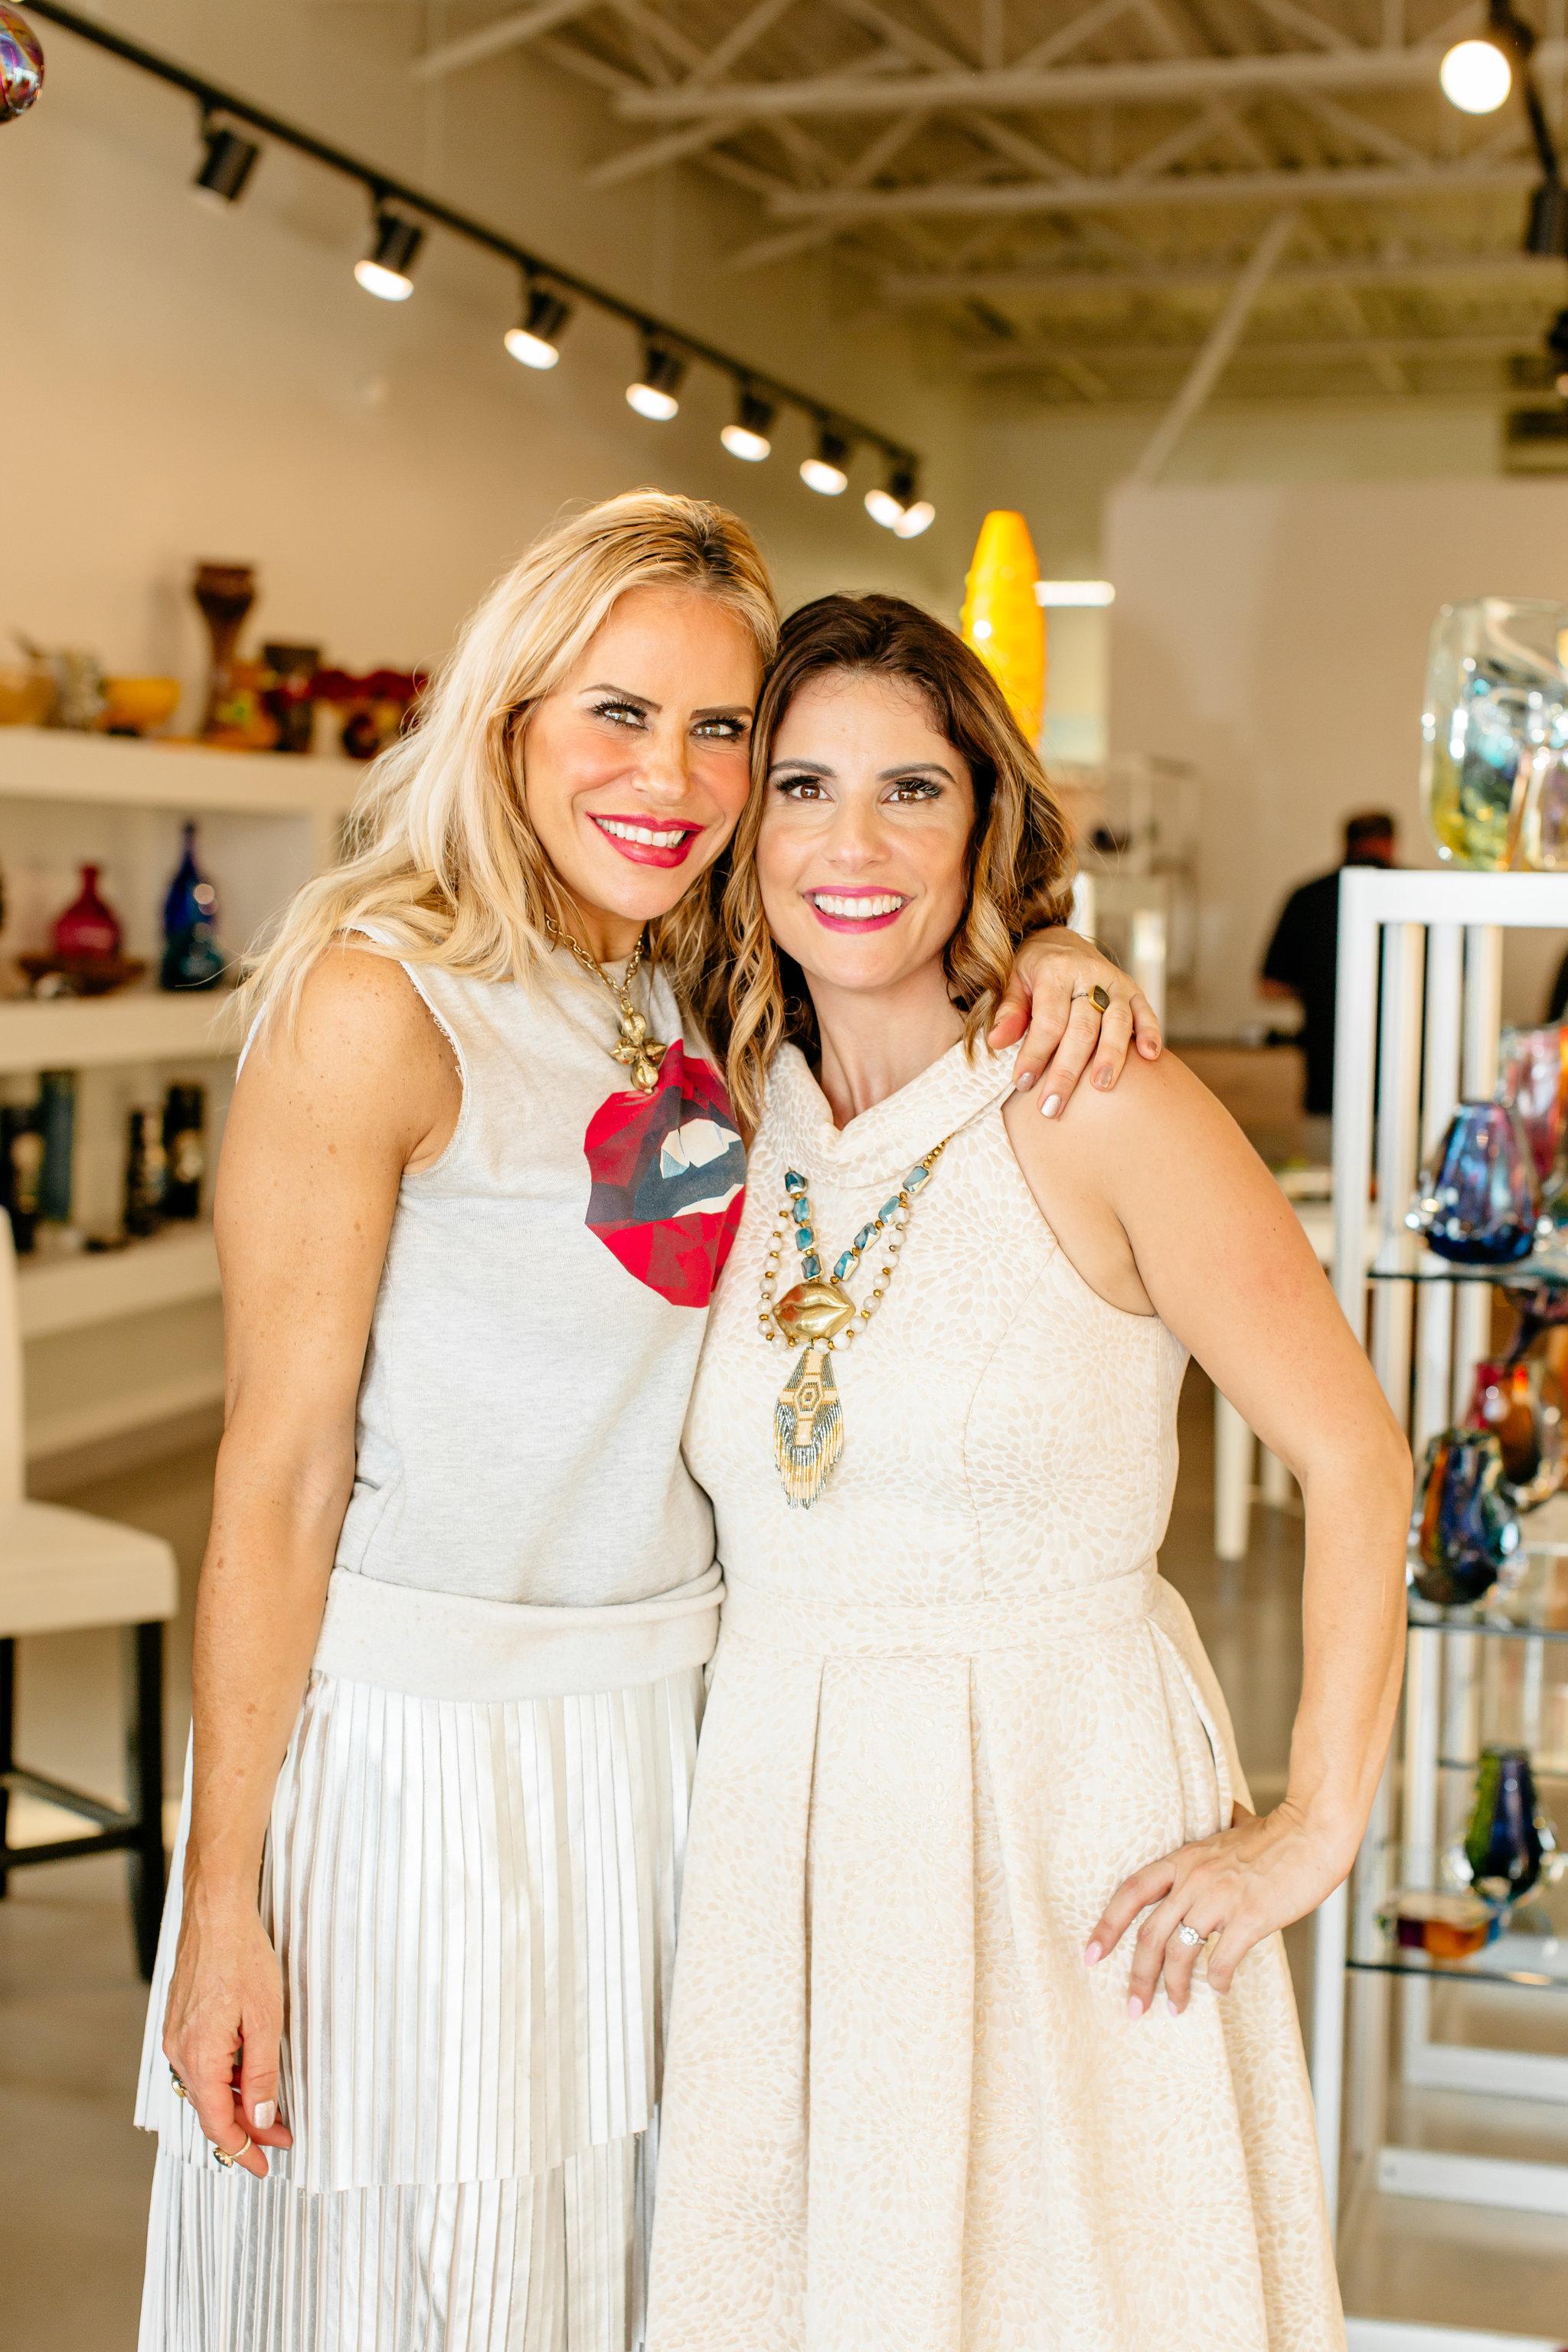 Alexa-Vossler-Photo_Dallas-Event-Photographer_Brite-Bar-Beauty-2018-Lipstick-Launch-Party-153.jpg